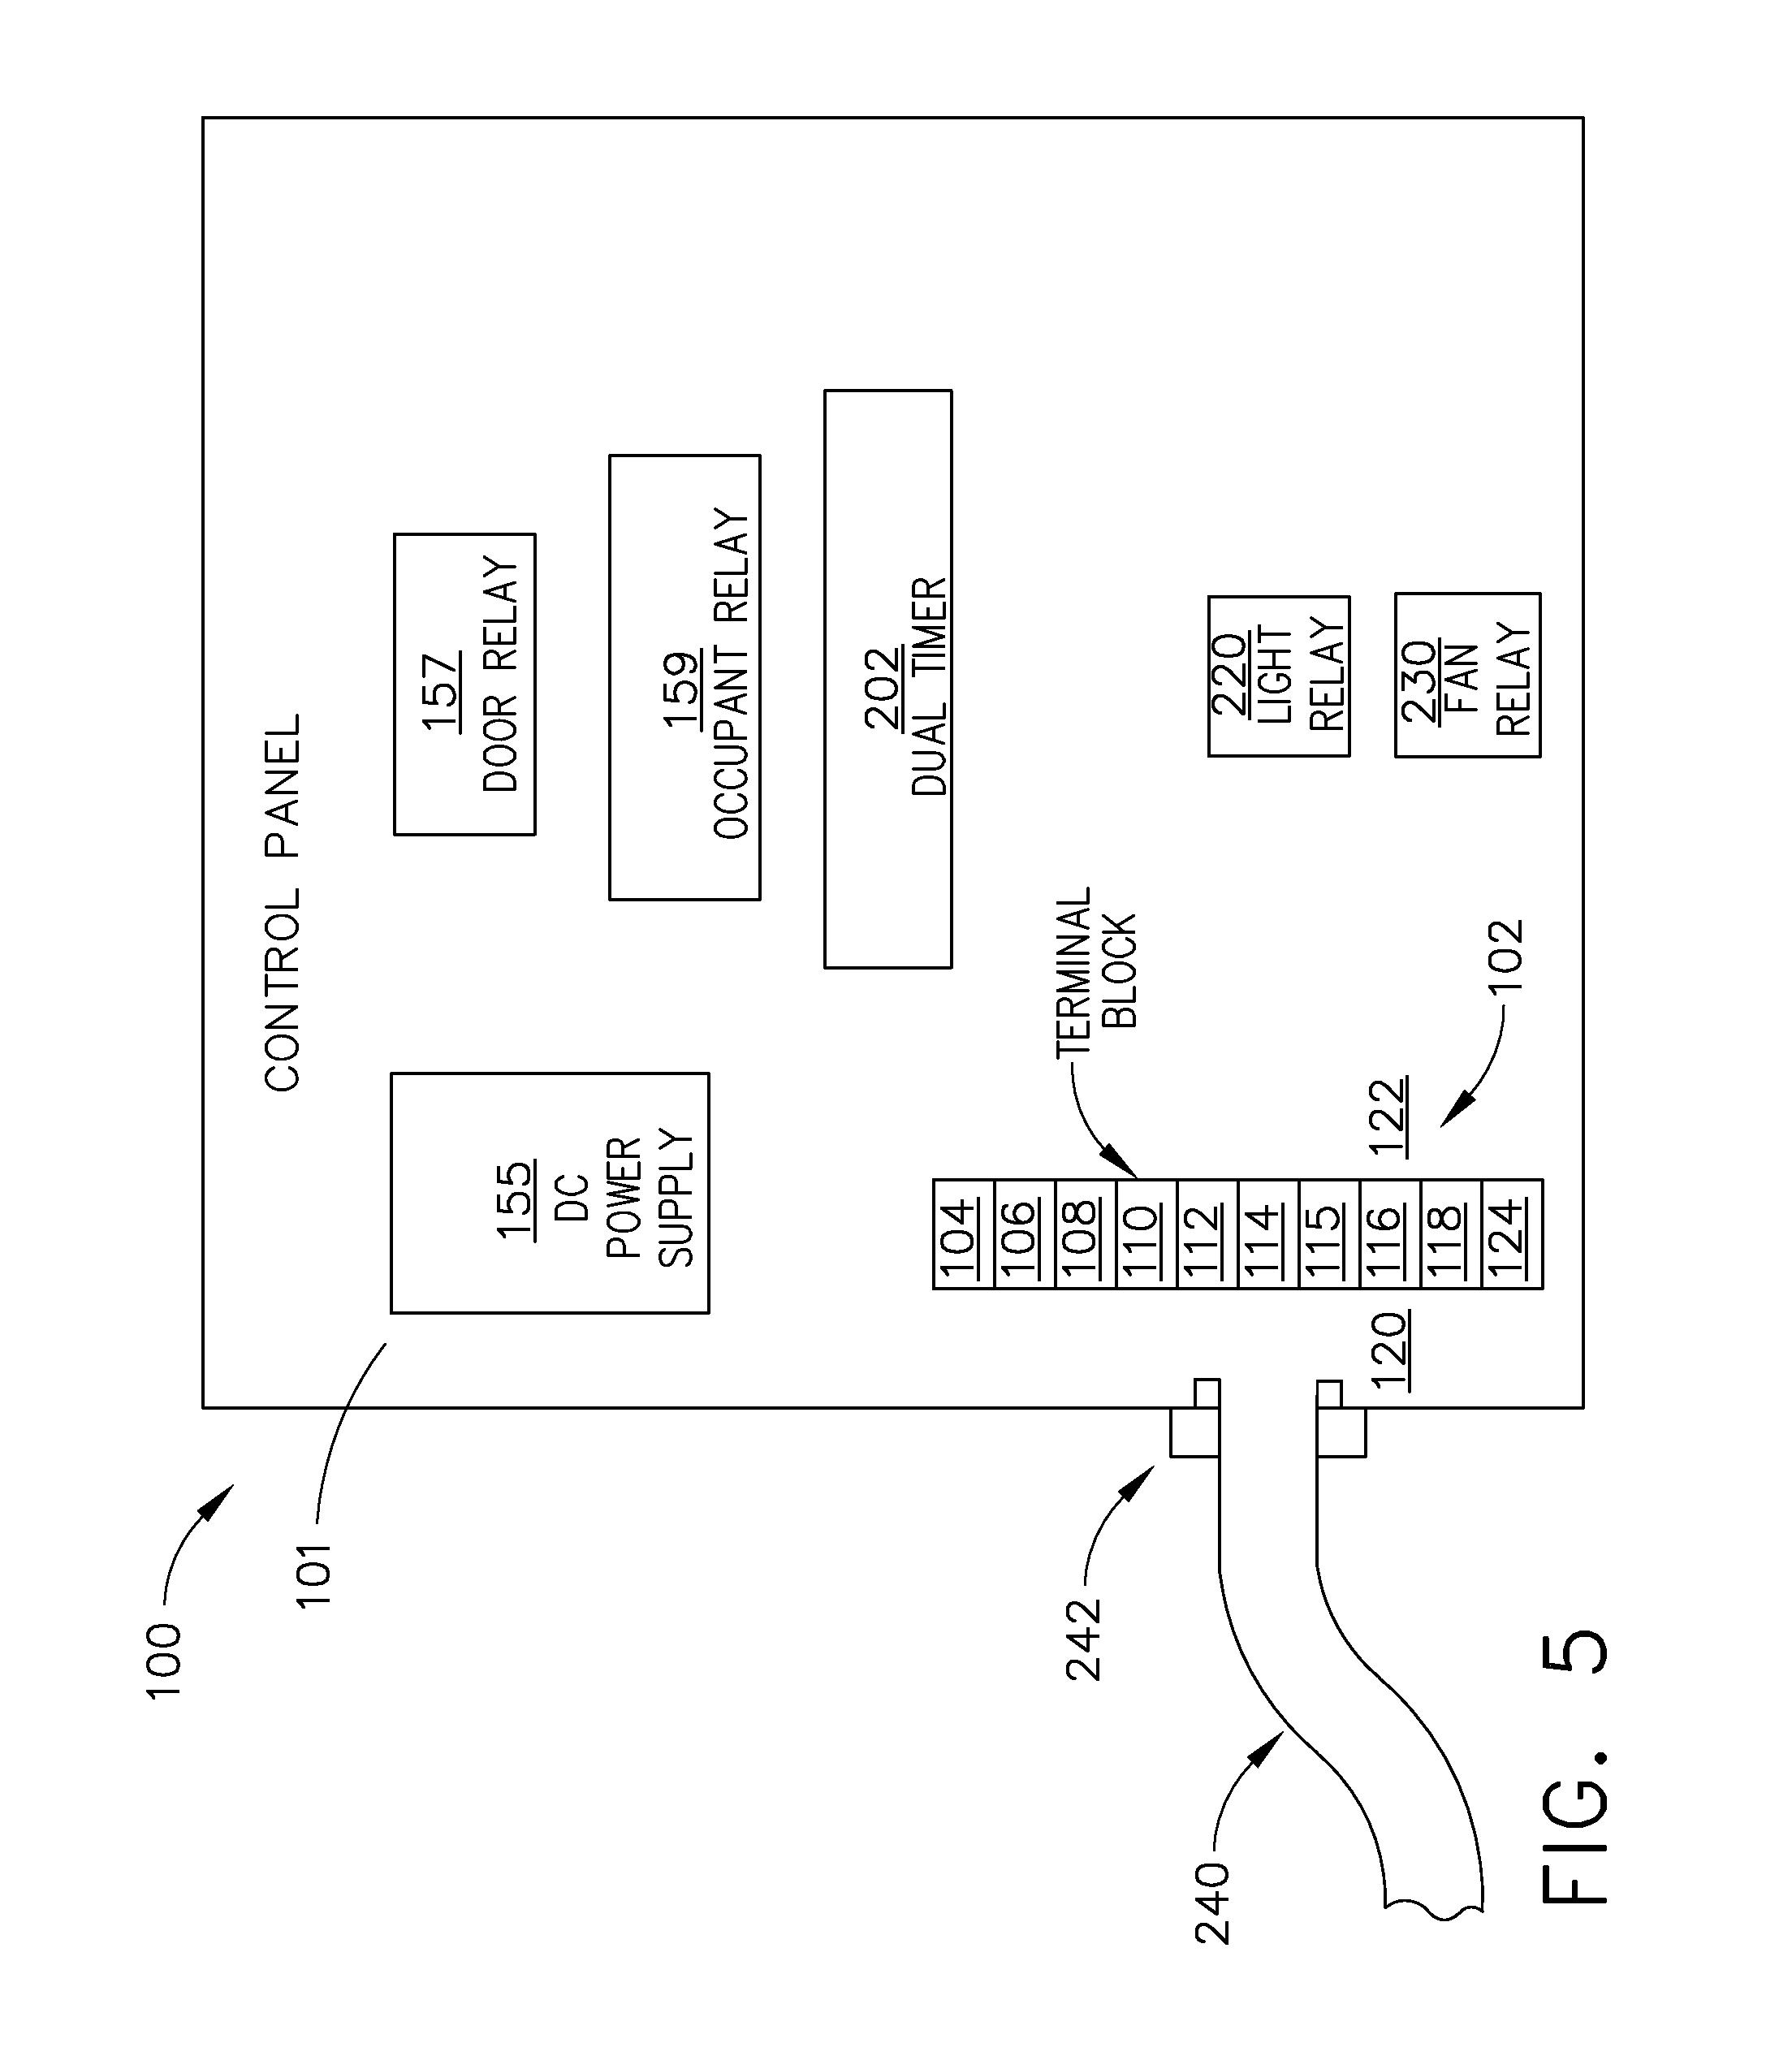 dover elevator wiring diagram residential electrical symbols u2022 rh bookmyad co